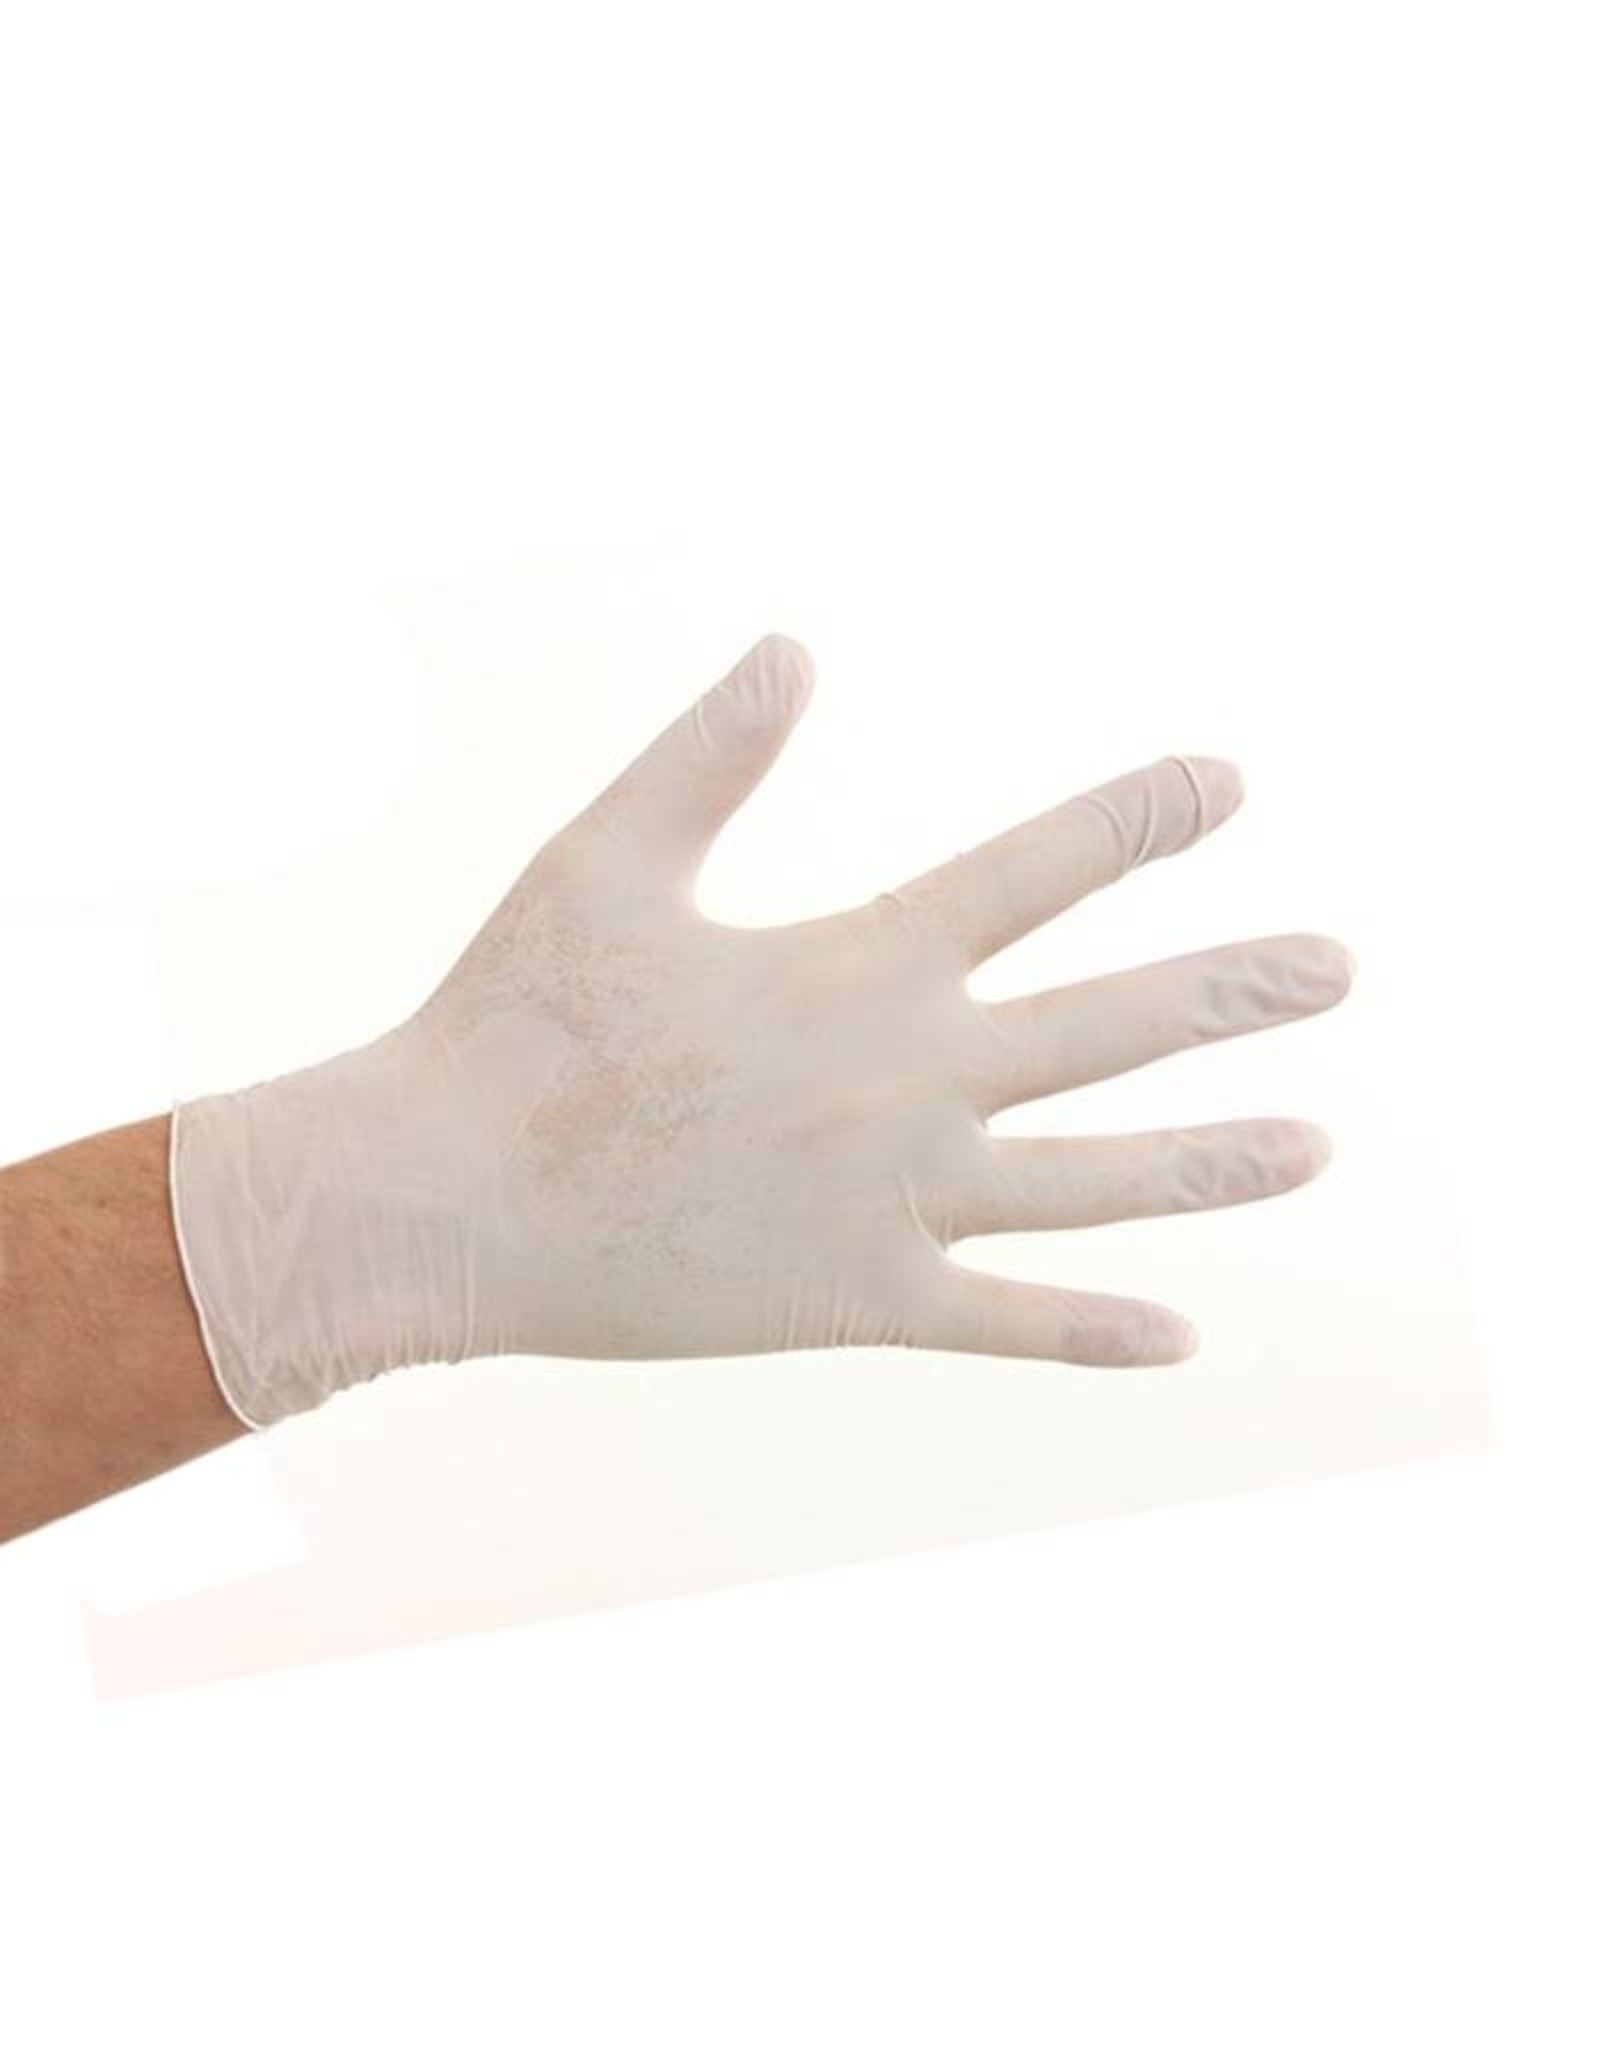 CMT CMT soft nitril handschoenen poedervrij XL wit